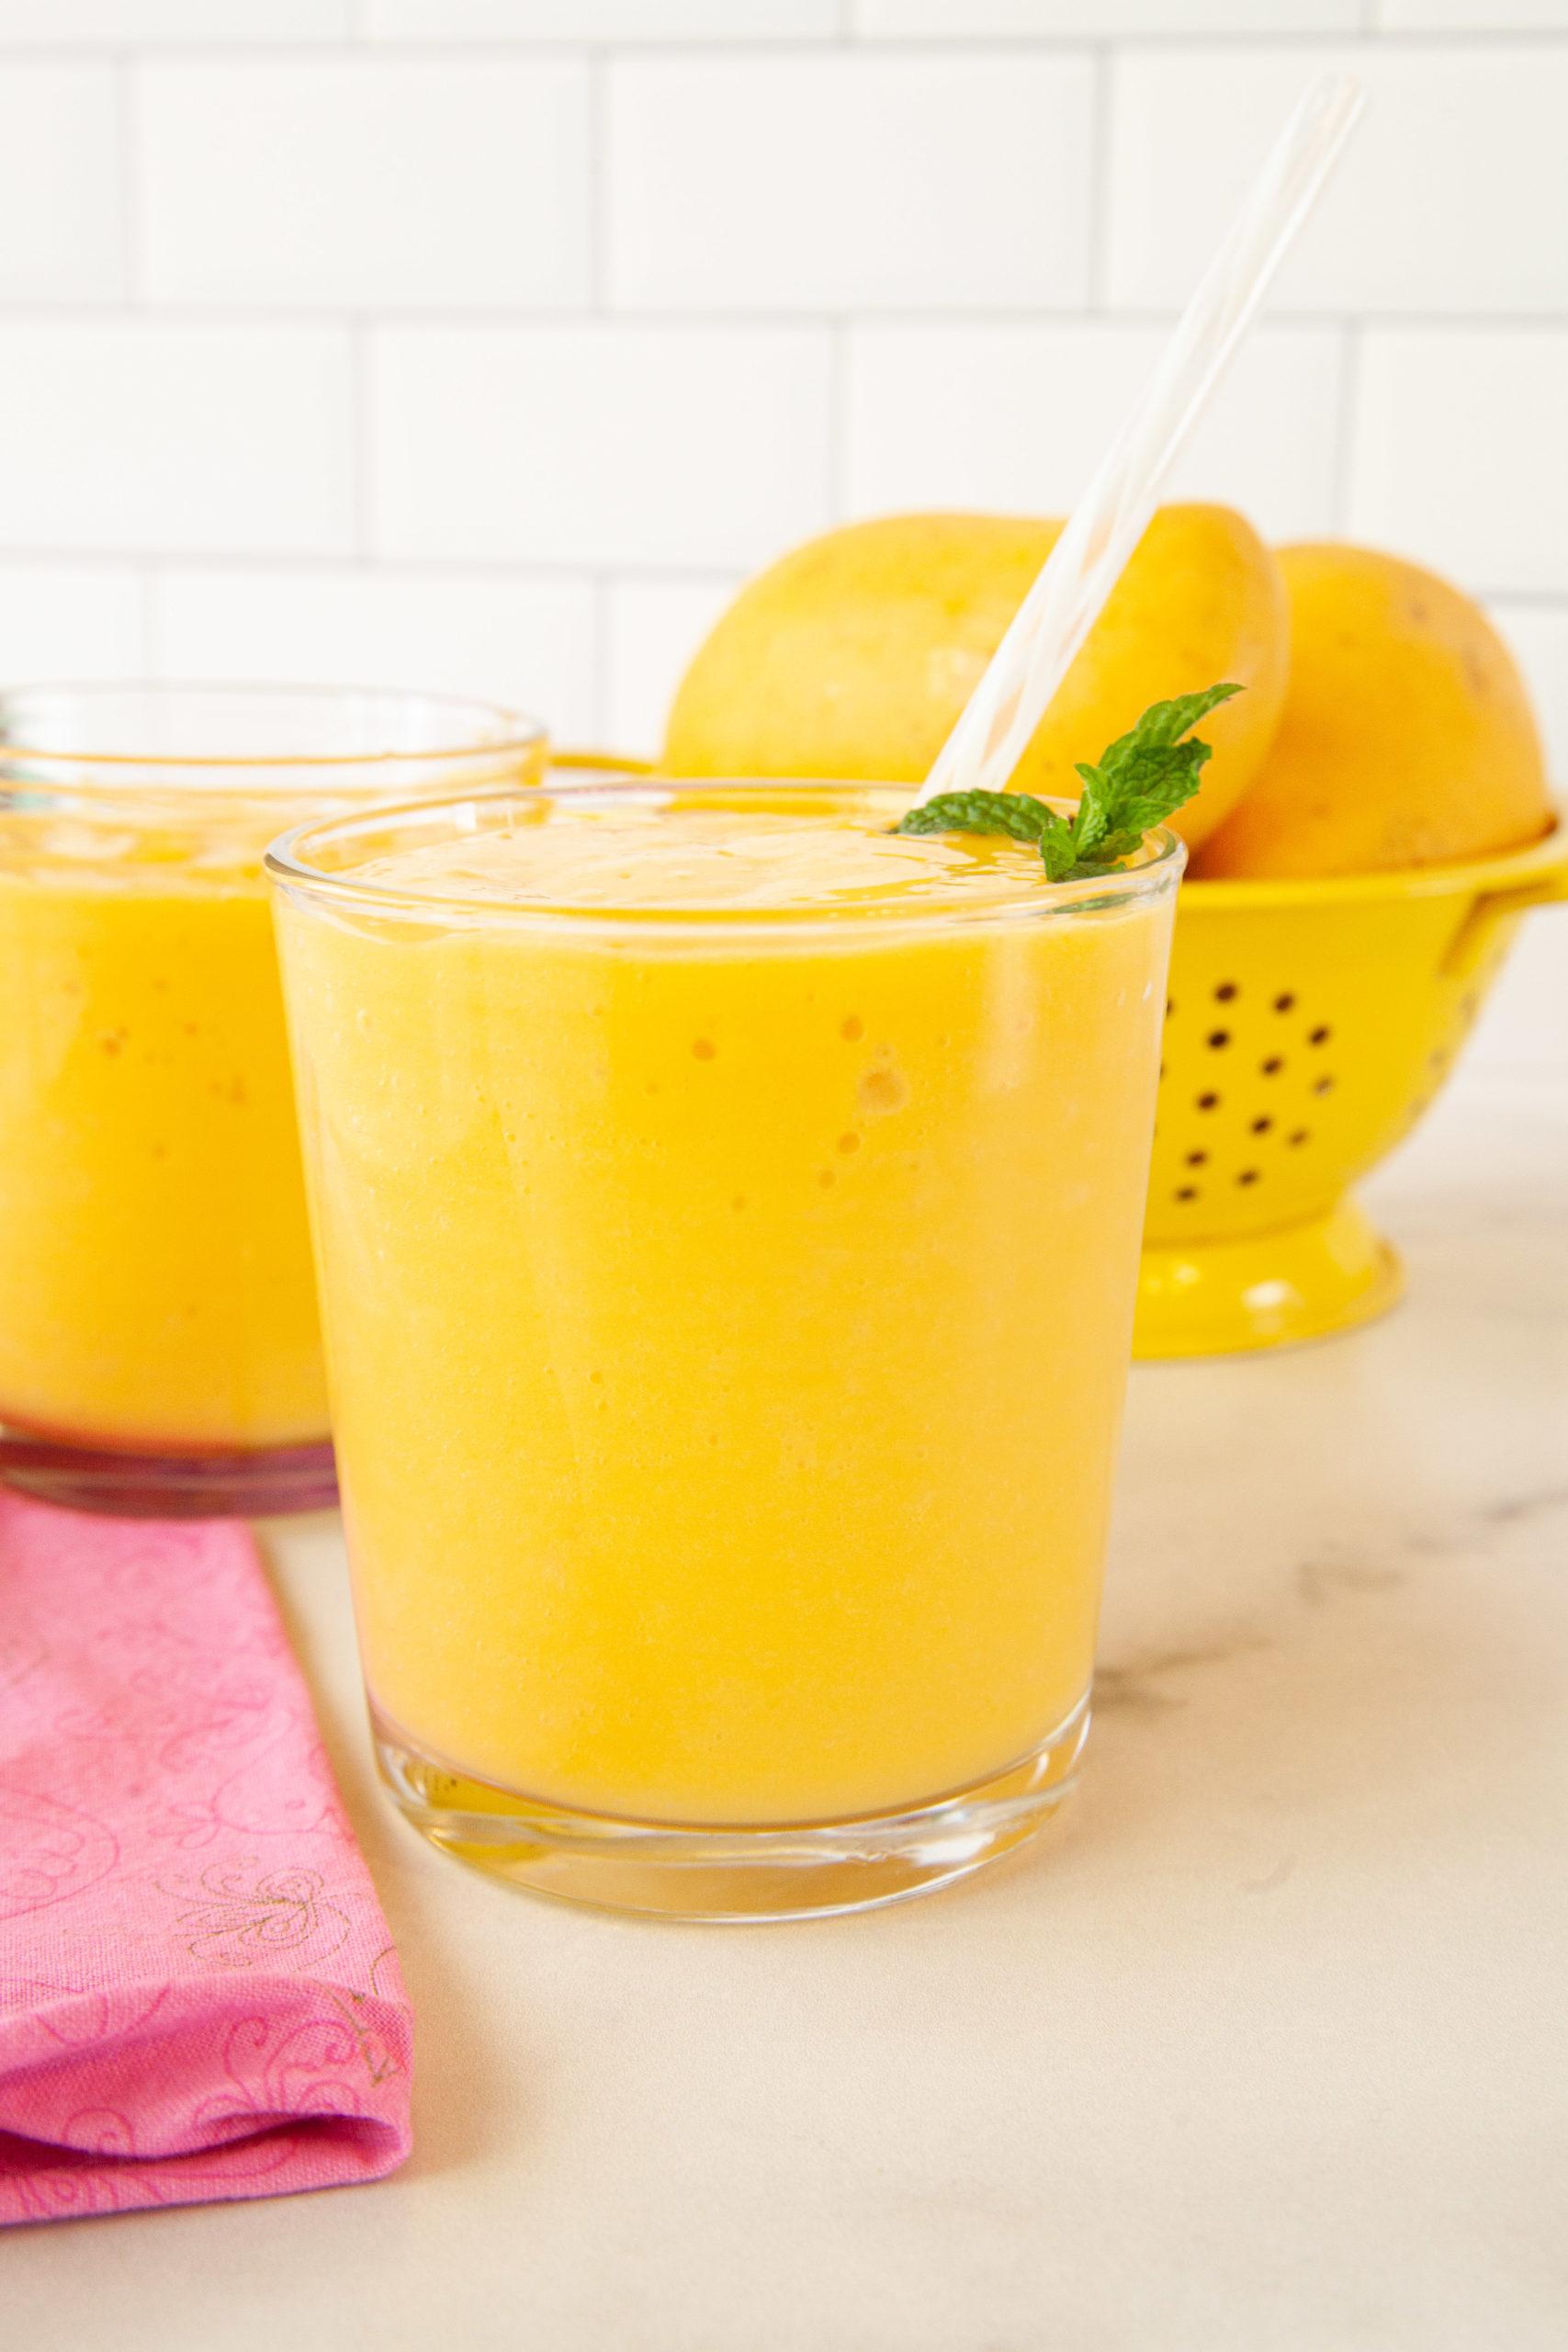 Closeup on a glass of mango smoothie.